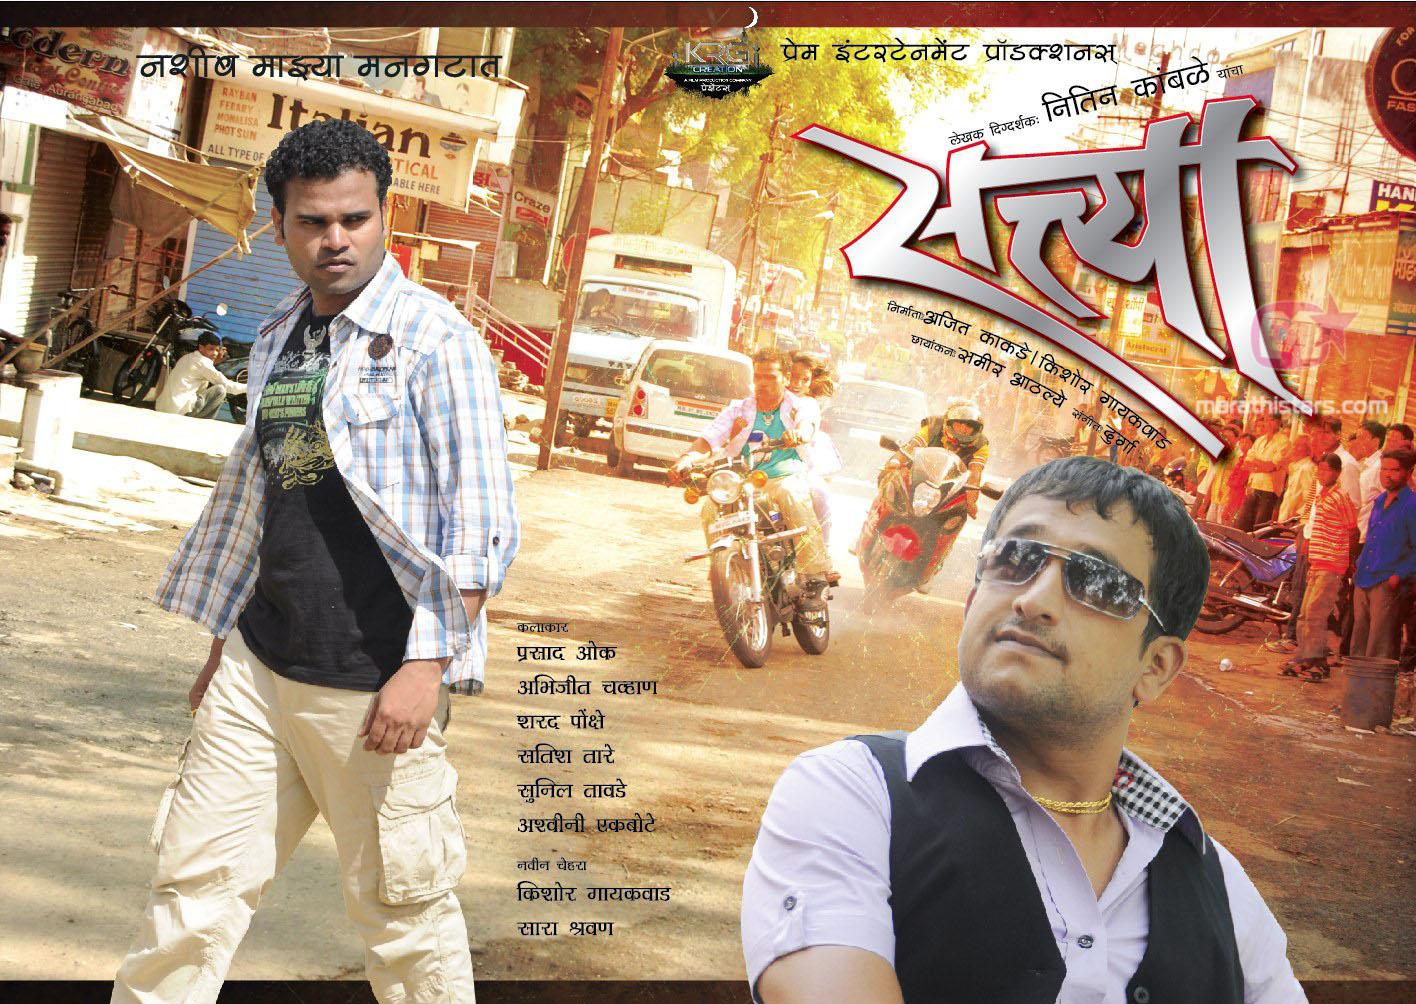 Satya 2016 Marathi Full Movie 480p AMZN DL AVC Download